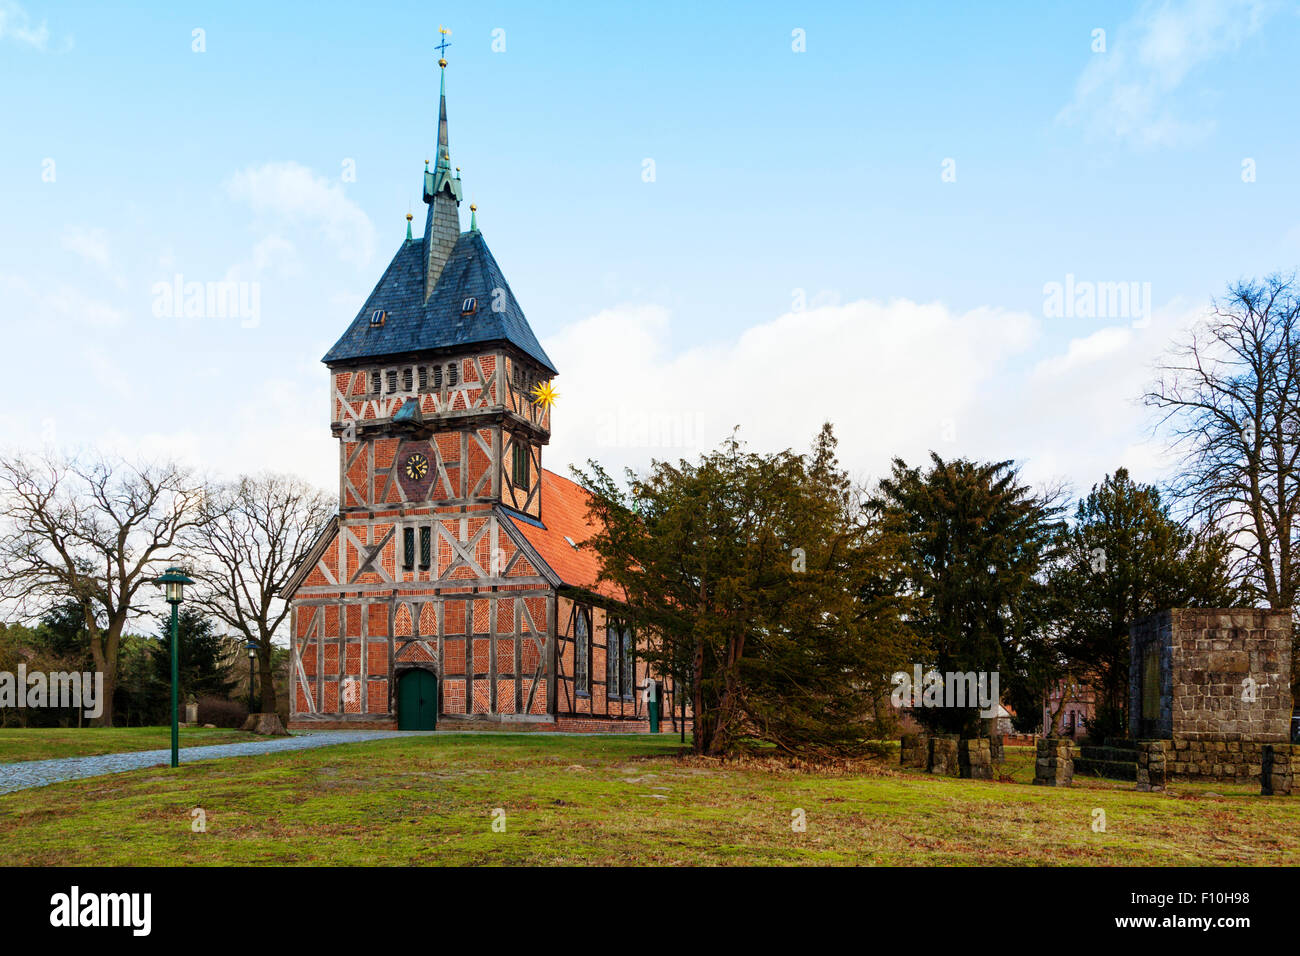 Historic half-timbered church at Tripkau, Lower Saxony - Stock Image